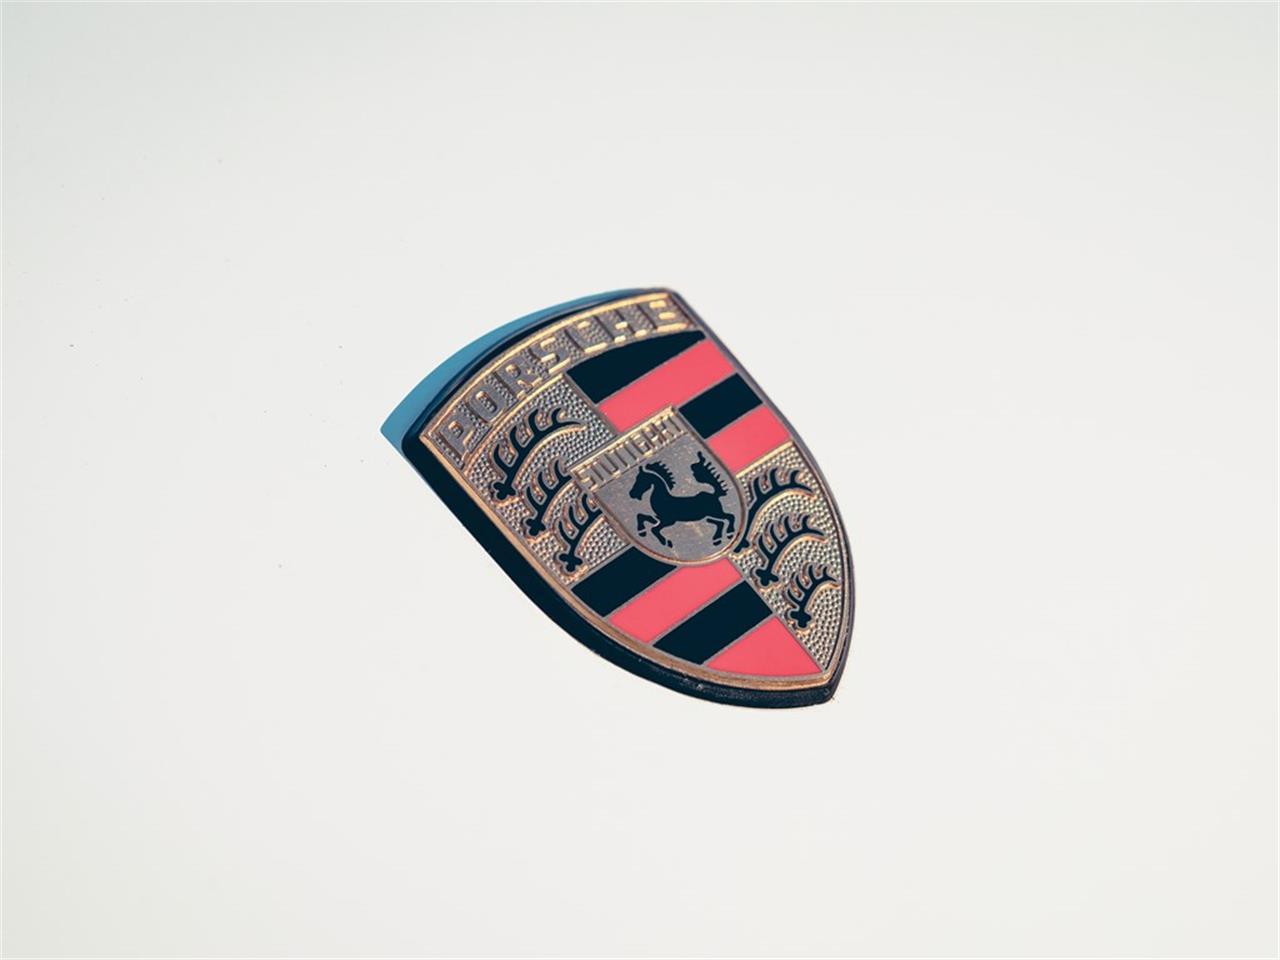 1973 Porsche 911 Carrera RS (CC-1199203) for sale in Cernobbio,